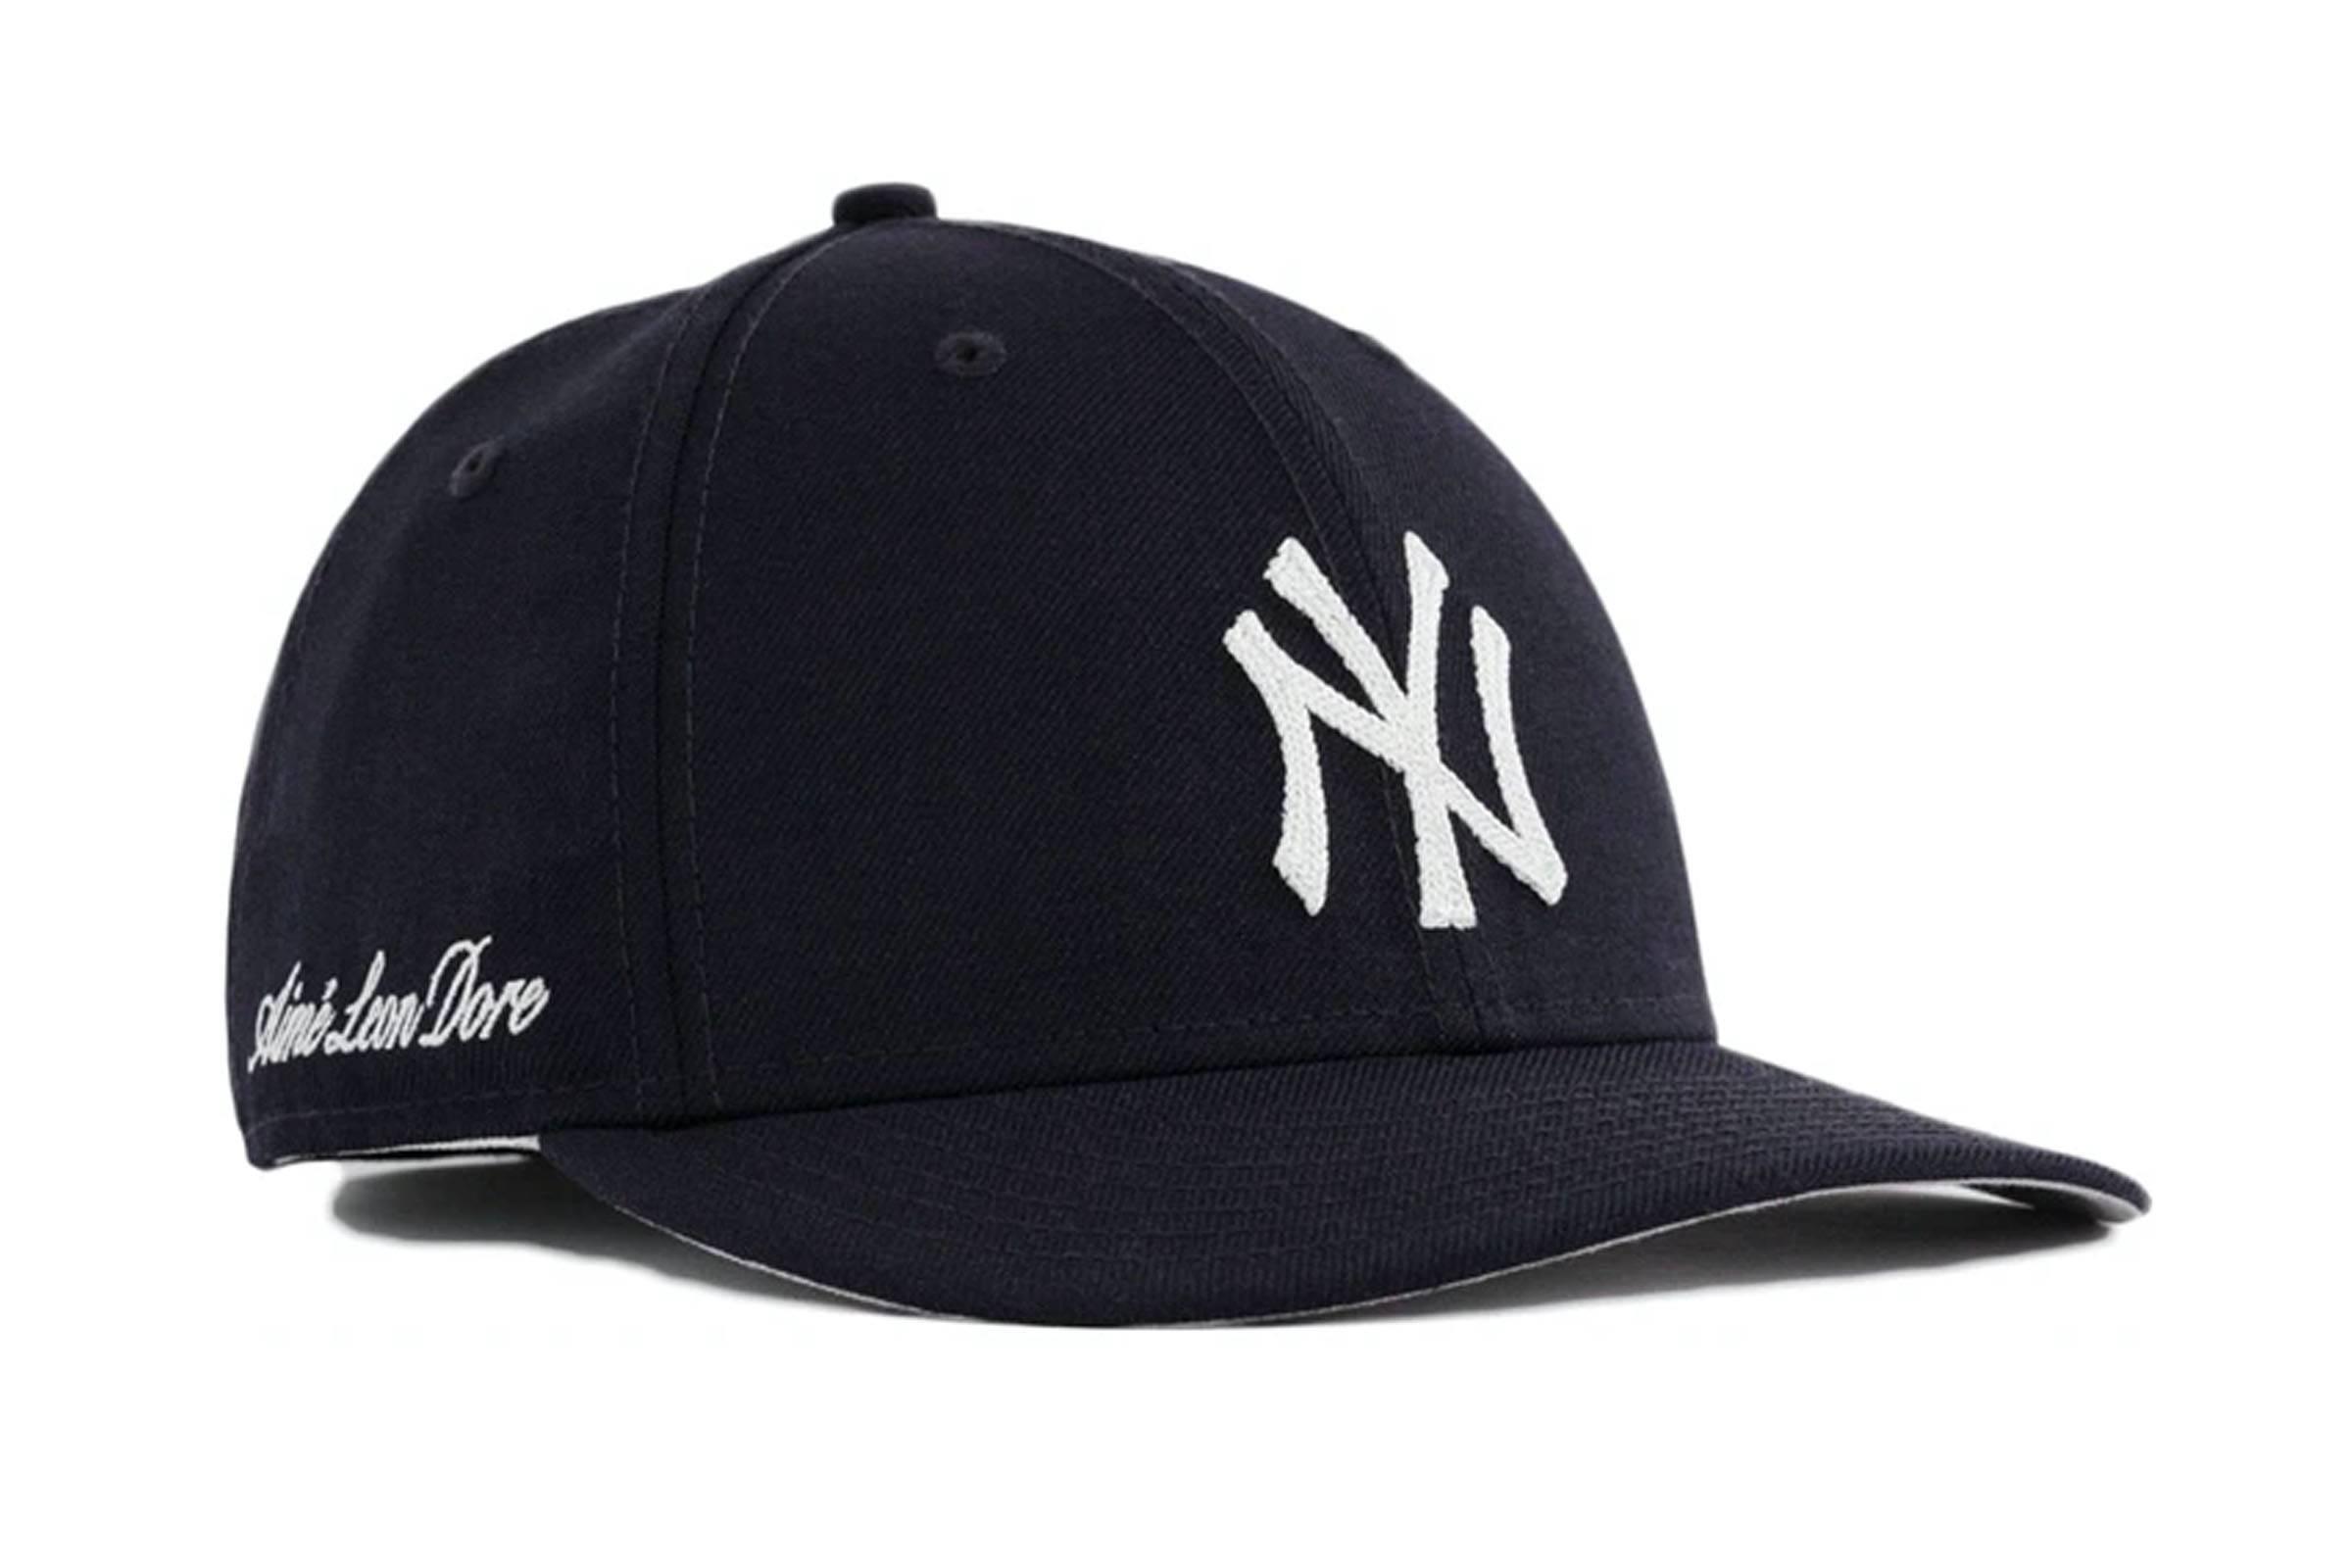 Aimé Leon Dore x New Era New York Yankees Chain Stitched Baseball Cap